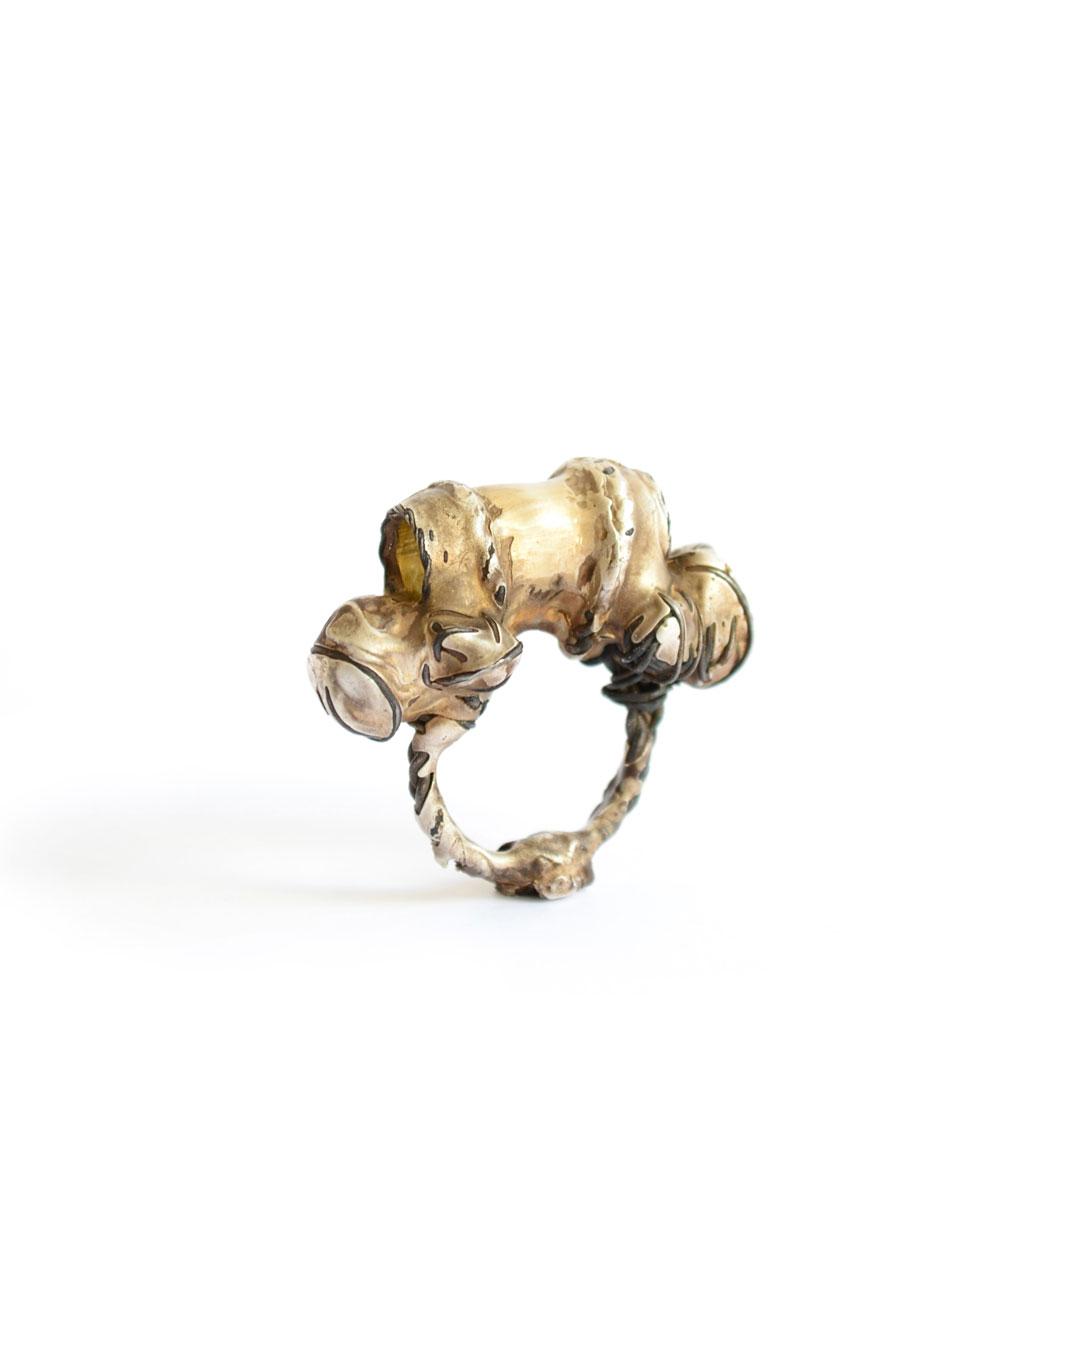 Dana Seachuga, Archetype Ring 8, 2014, ring; iron, silver, 35 x 42 x 18 mm, €605